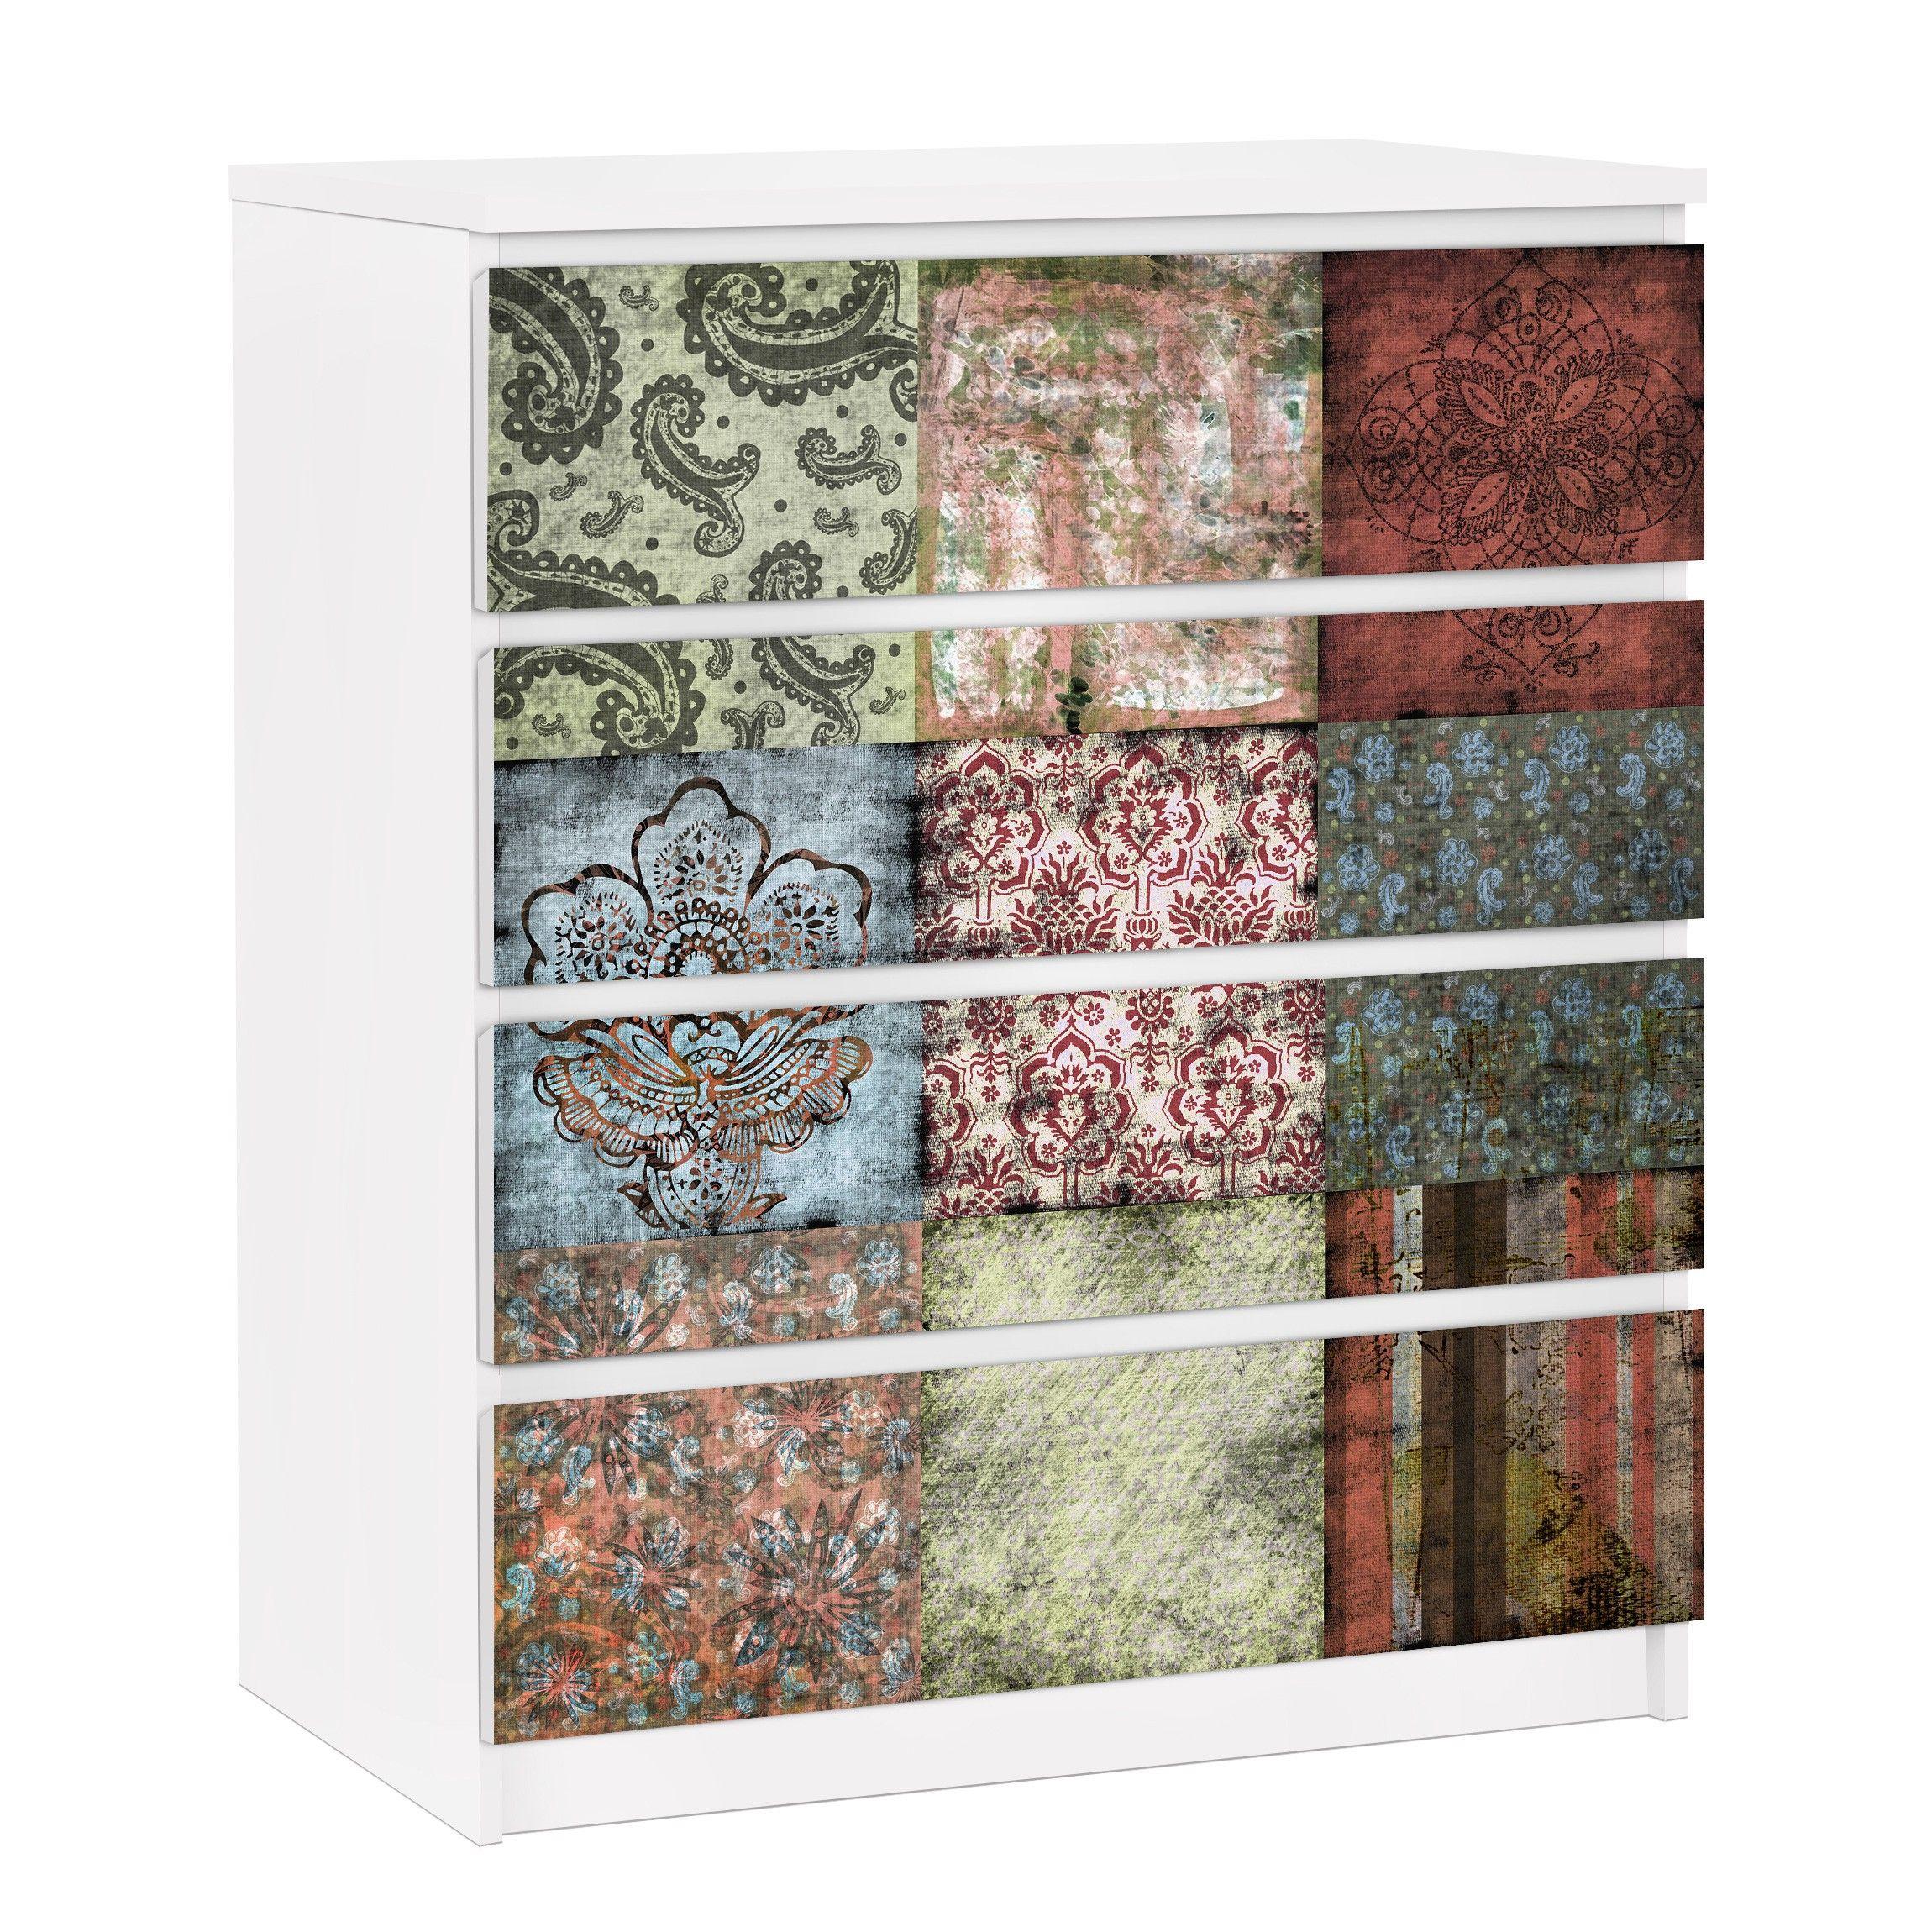 Möbelfolie für IKEA Malm Kommode – selbstklebende Folie Old Patterns, Größe:4 mal 20cm x 80cm